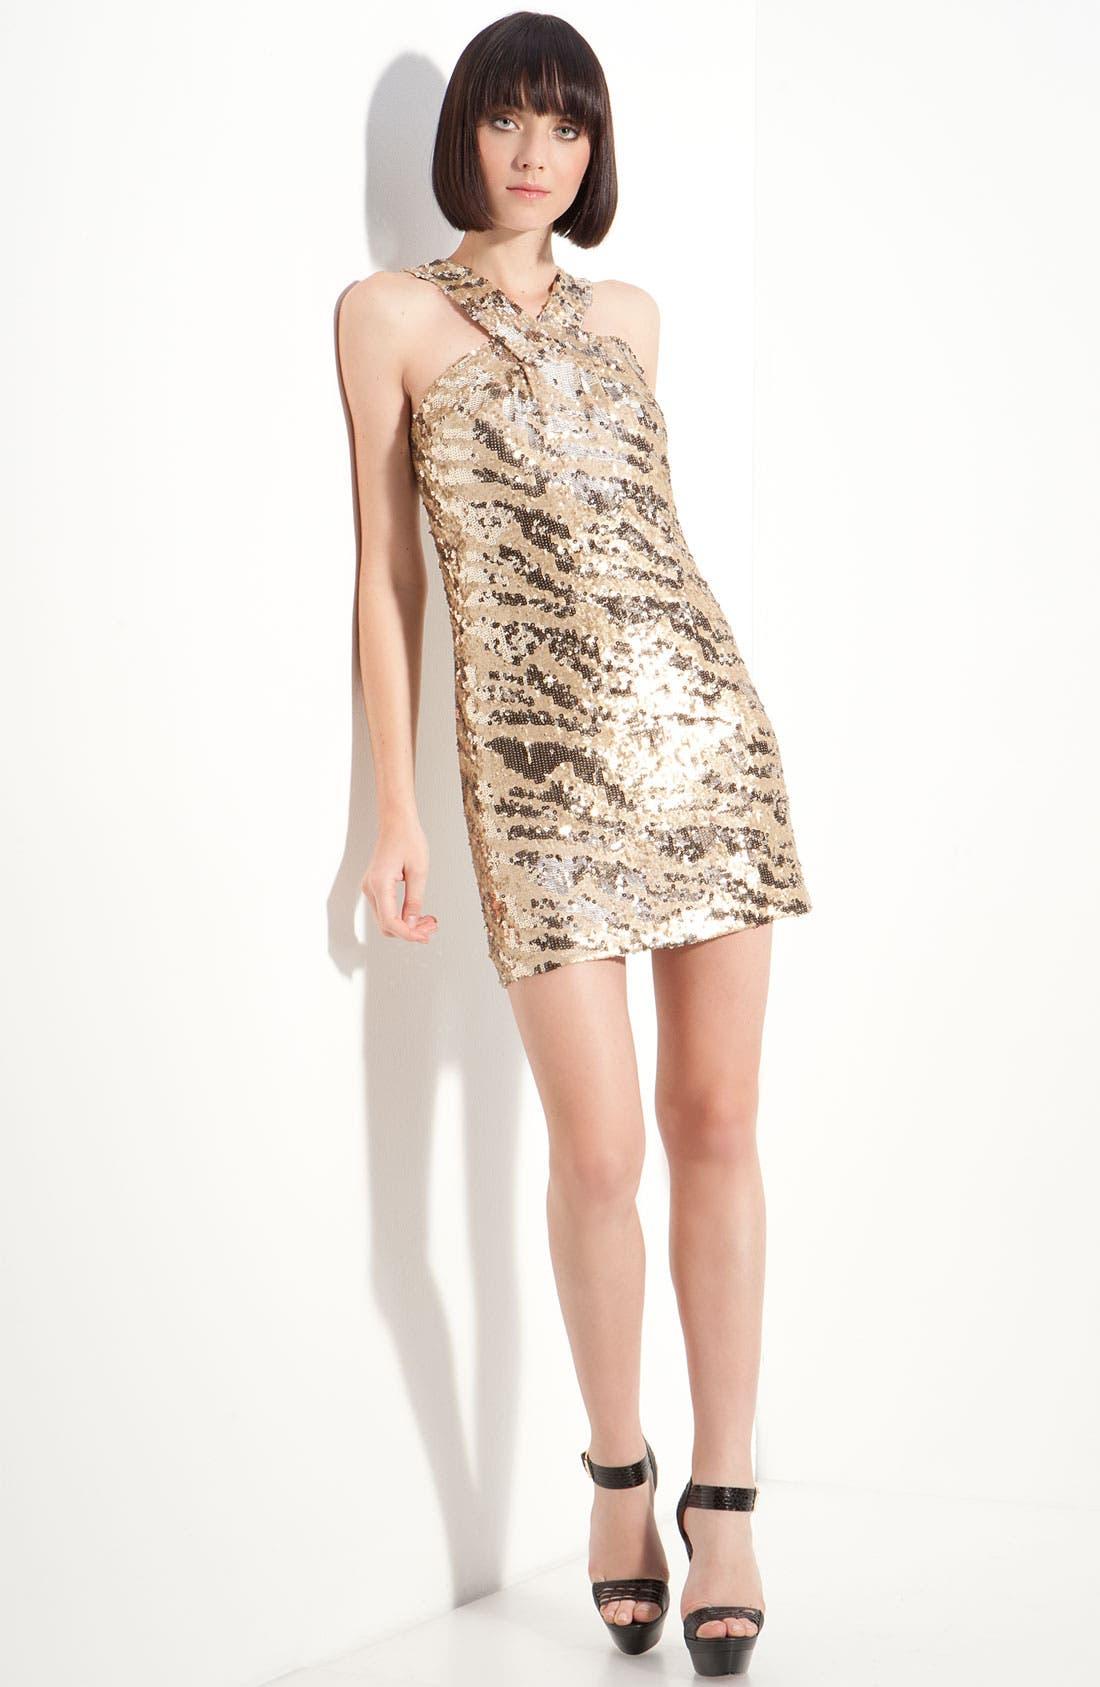 Alternate Image 1 Selected - Rachel Zoe 'Brenda' Sequin Shift Dress